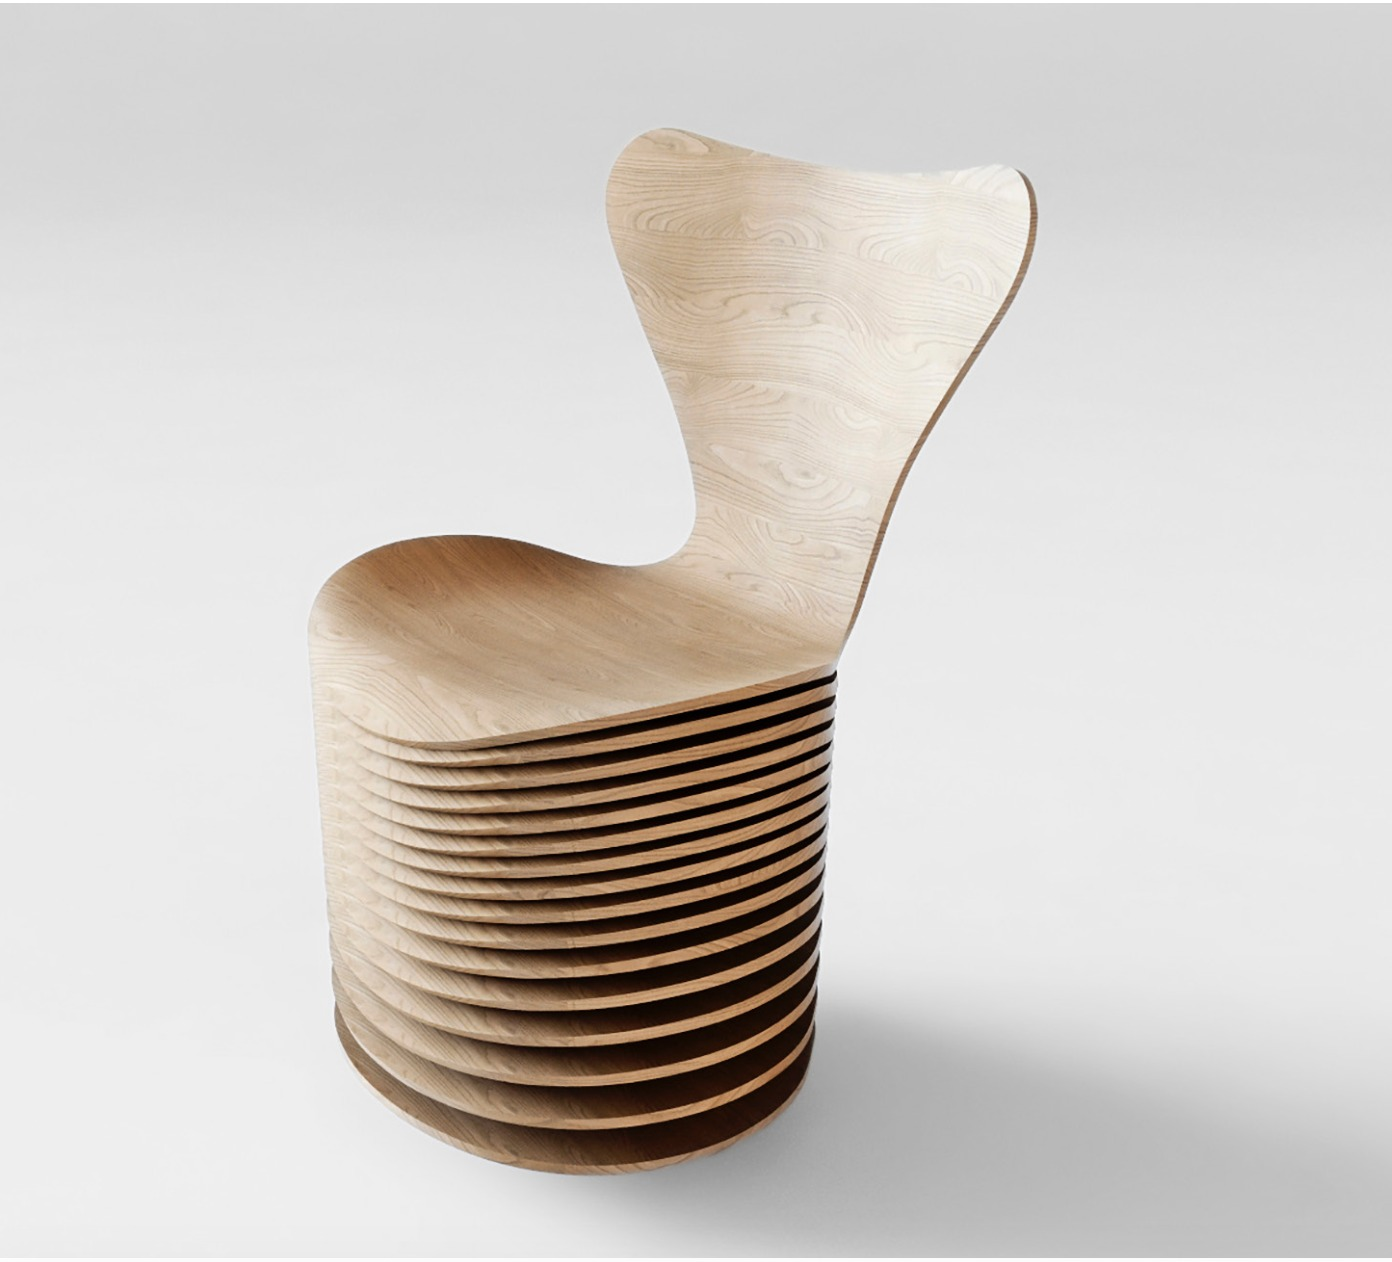 BIG, Jean Nouvel y 5 otros arquitectos reinterpretan 'Series 7 Chair' de Arne Jacobsen